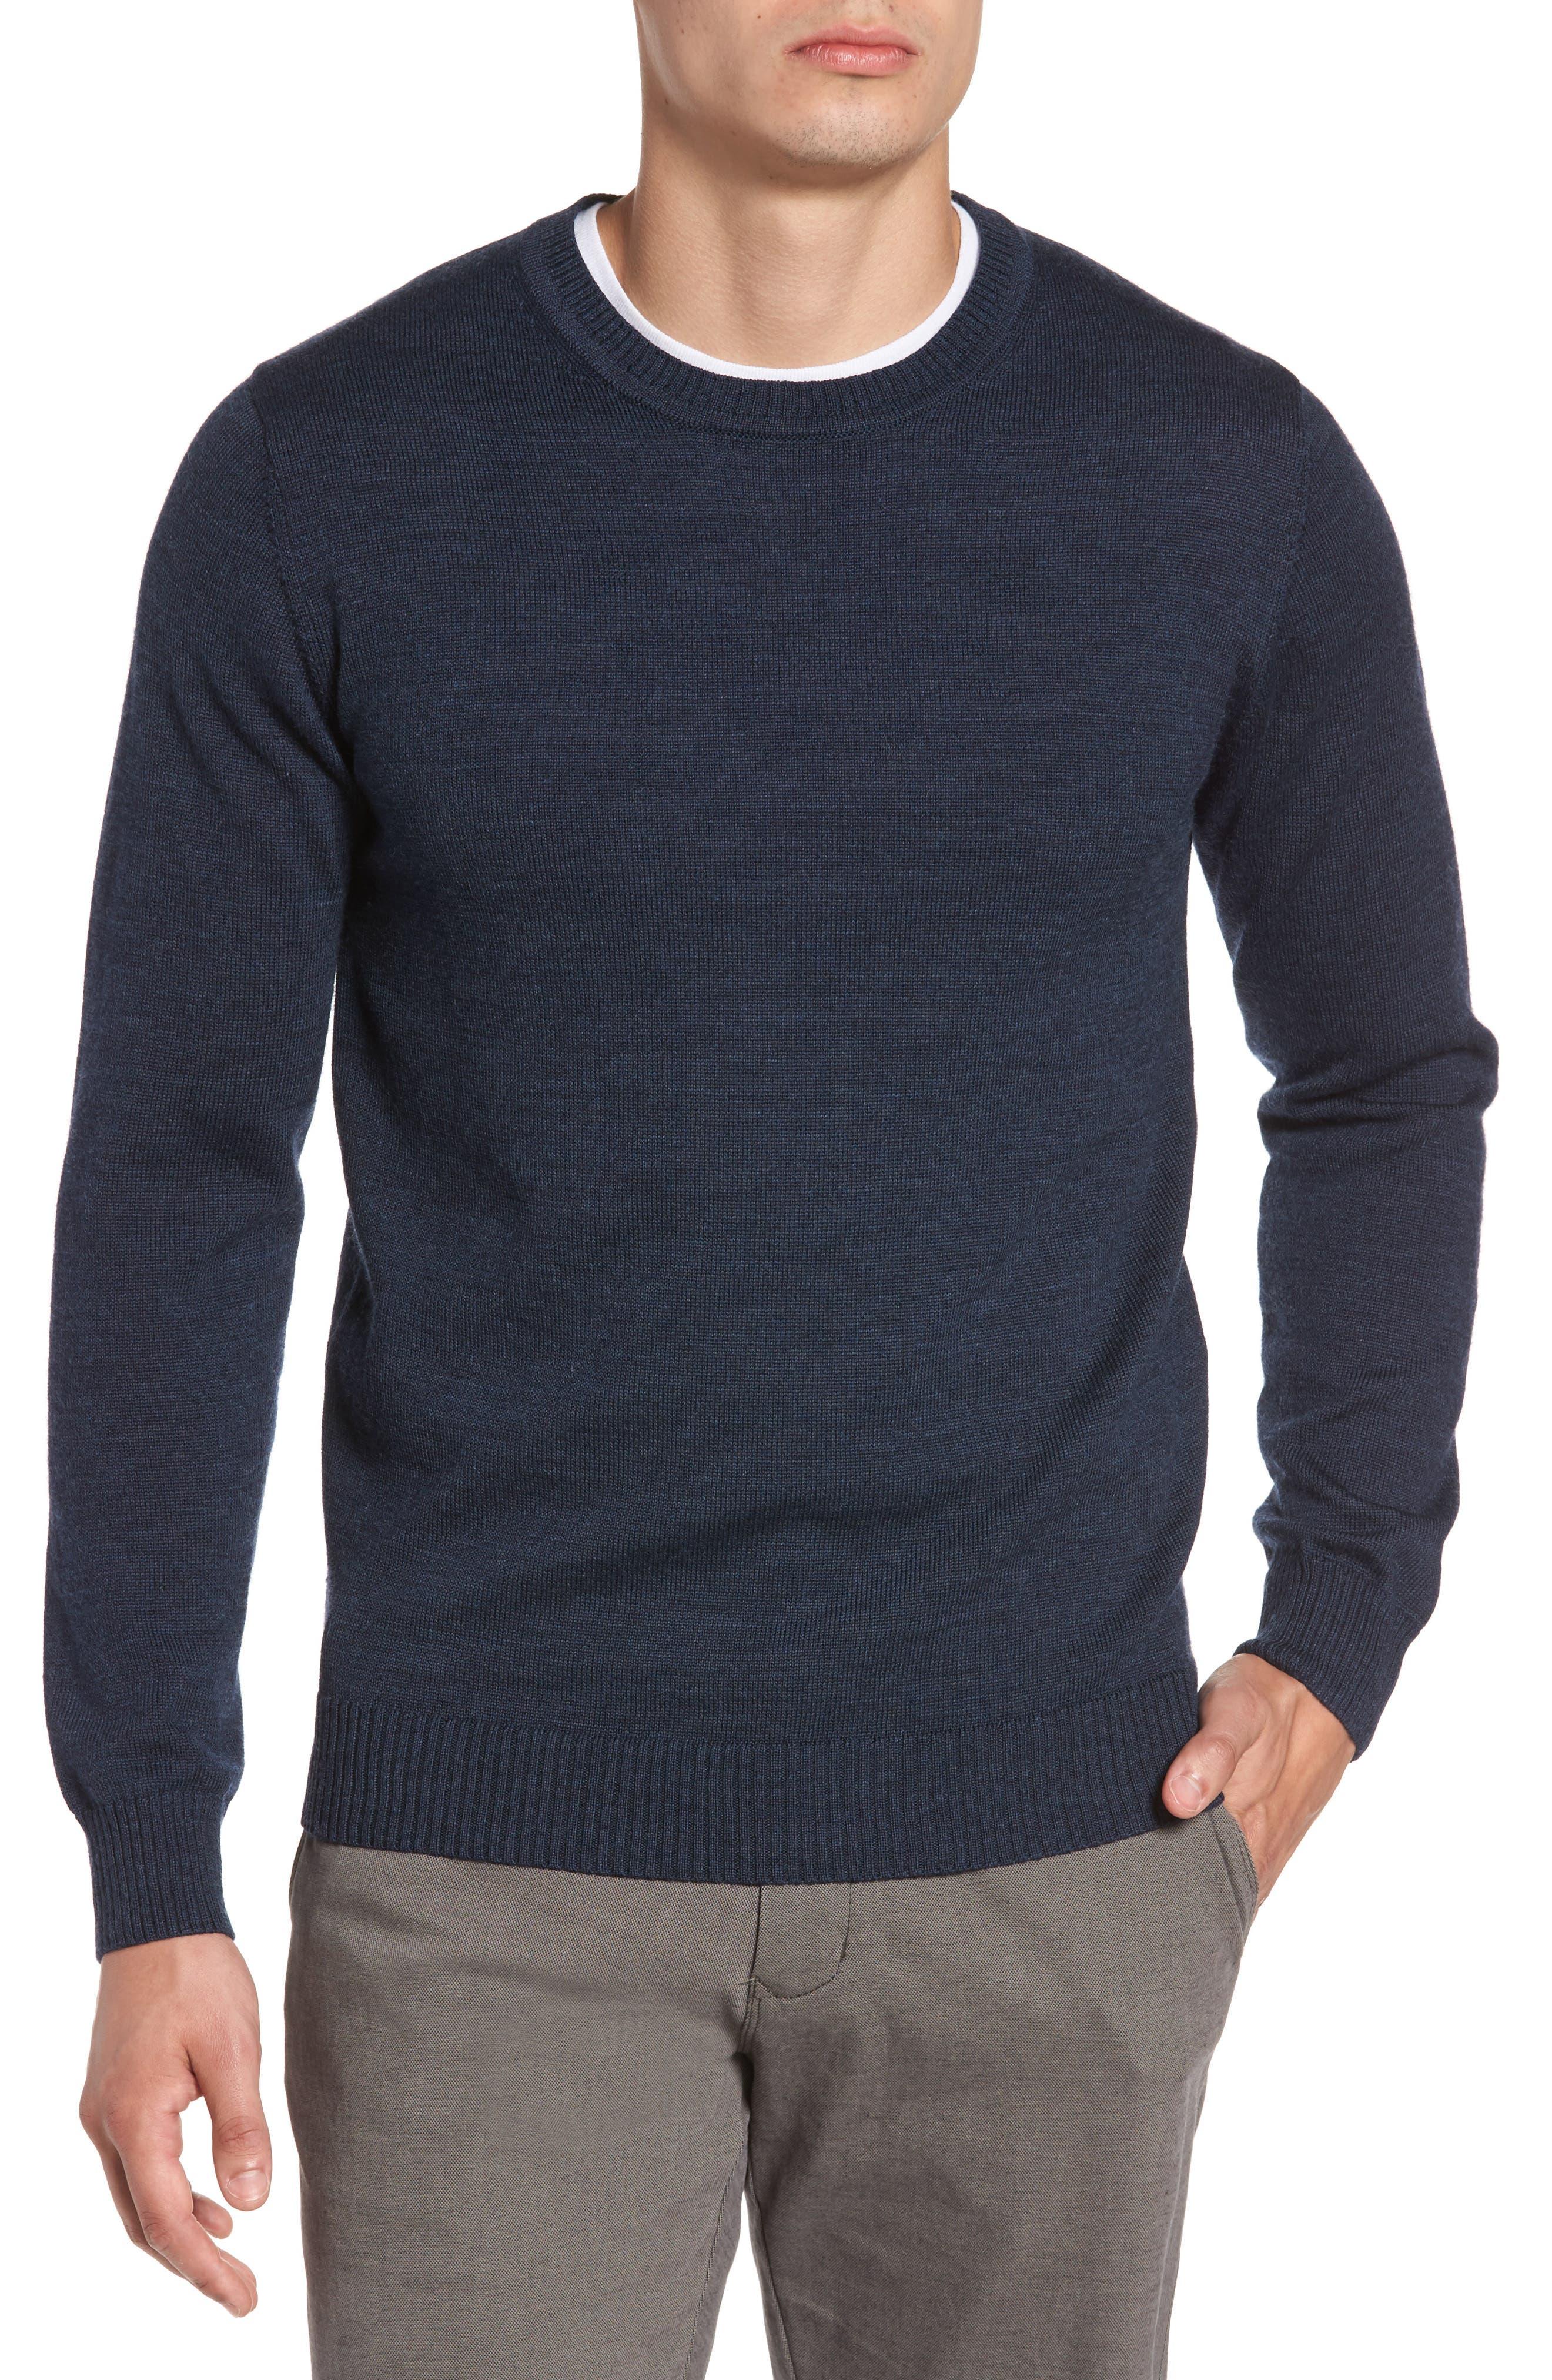 Bannockburn Mélange Merino Wool Sweater,                             Main thumbnail 1, color,                             Ink